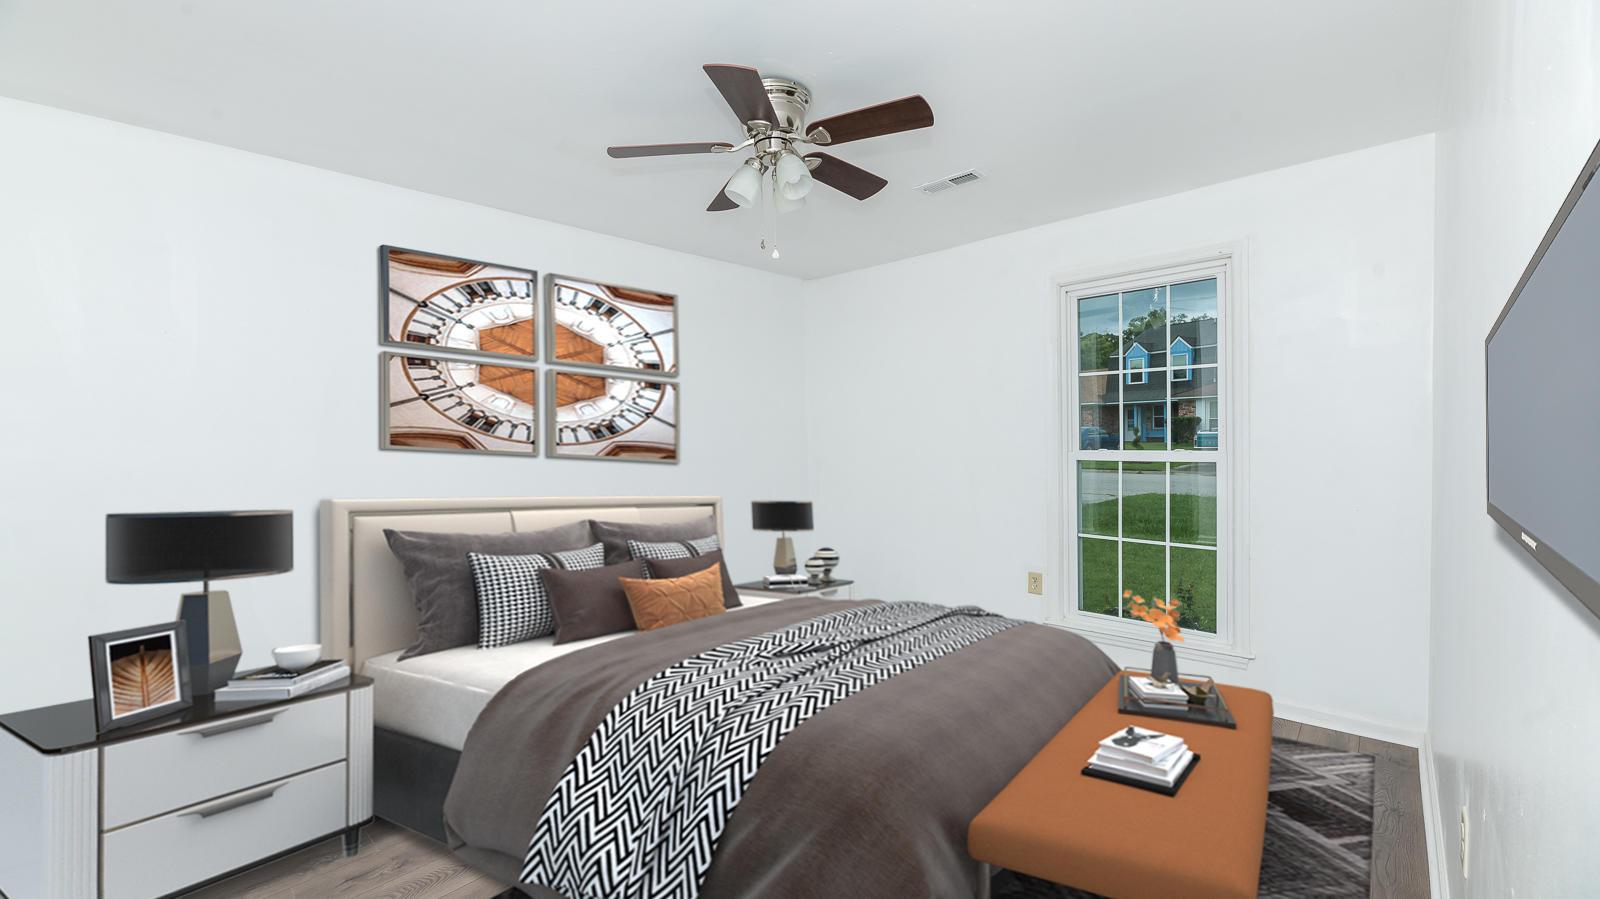 Ashley Villas Homes For Sale - 4315 Briarstone, North Charleston, SC - 24